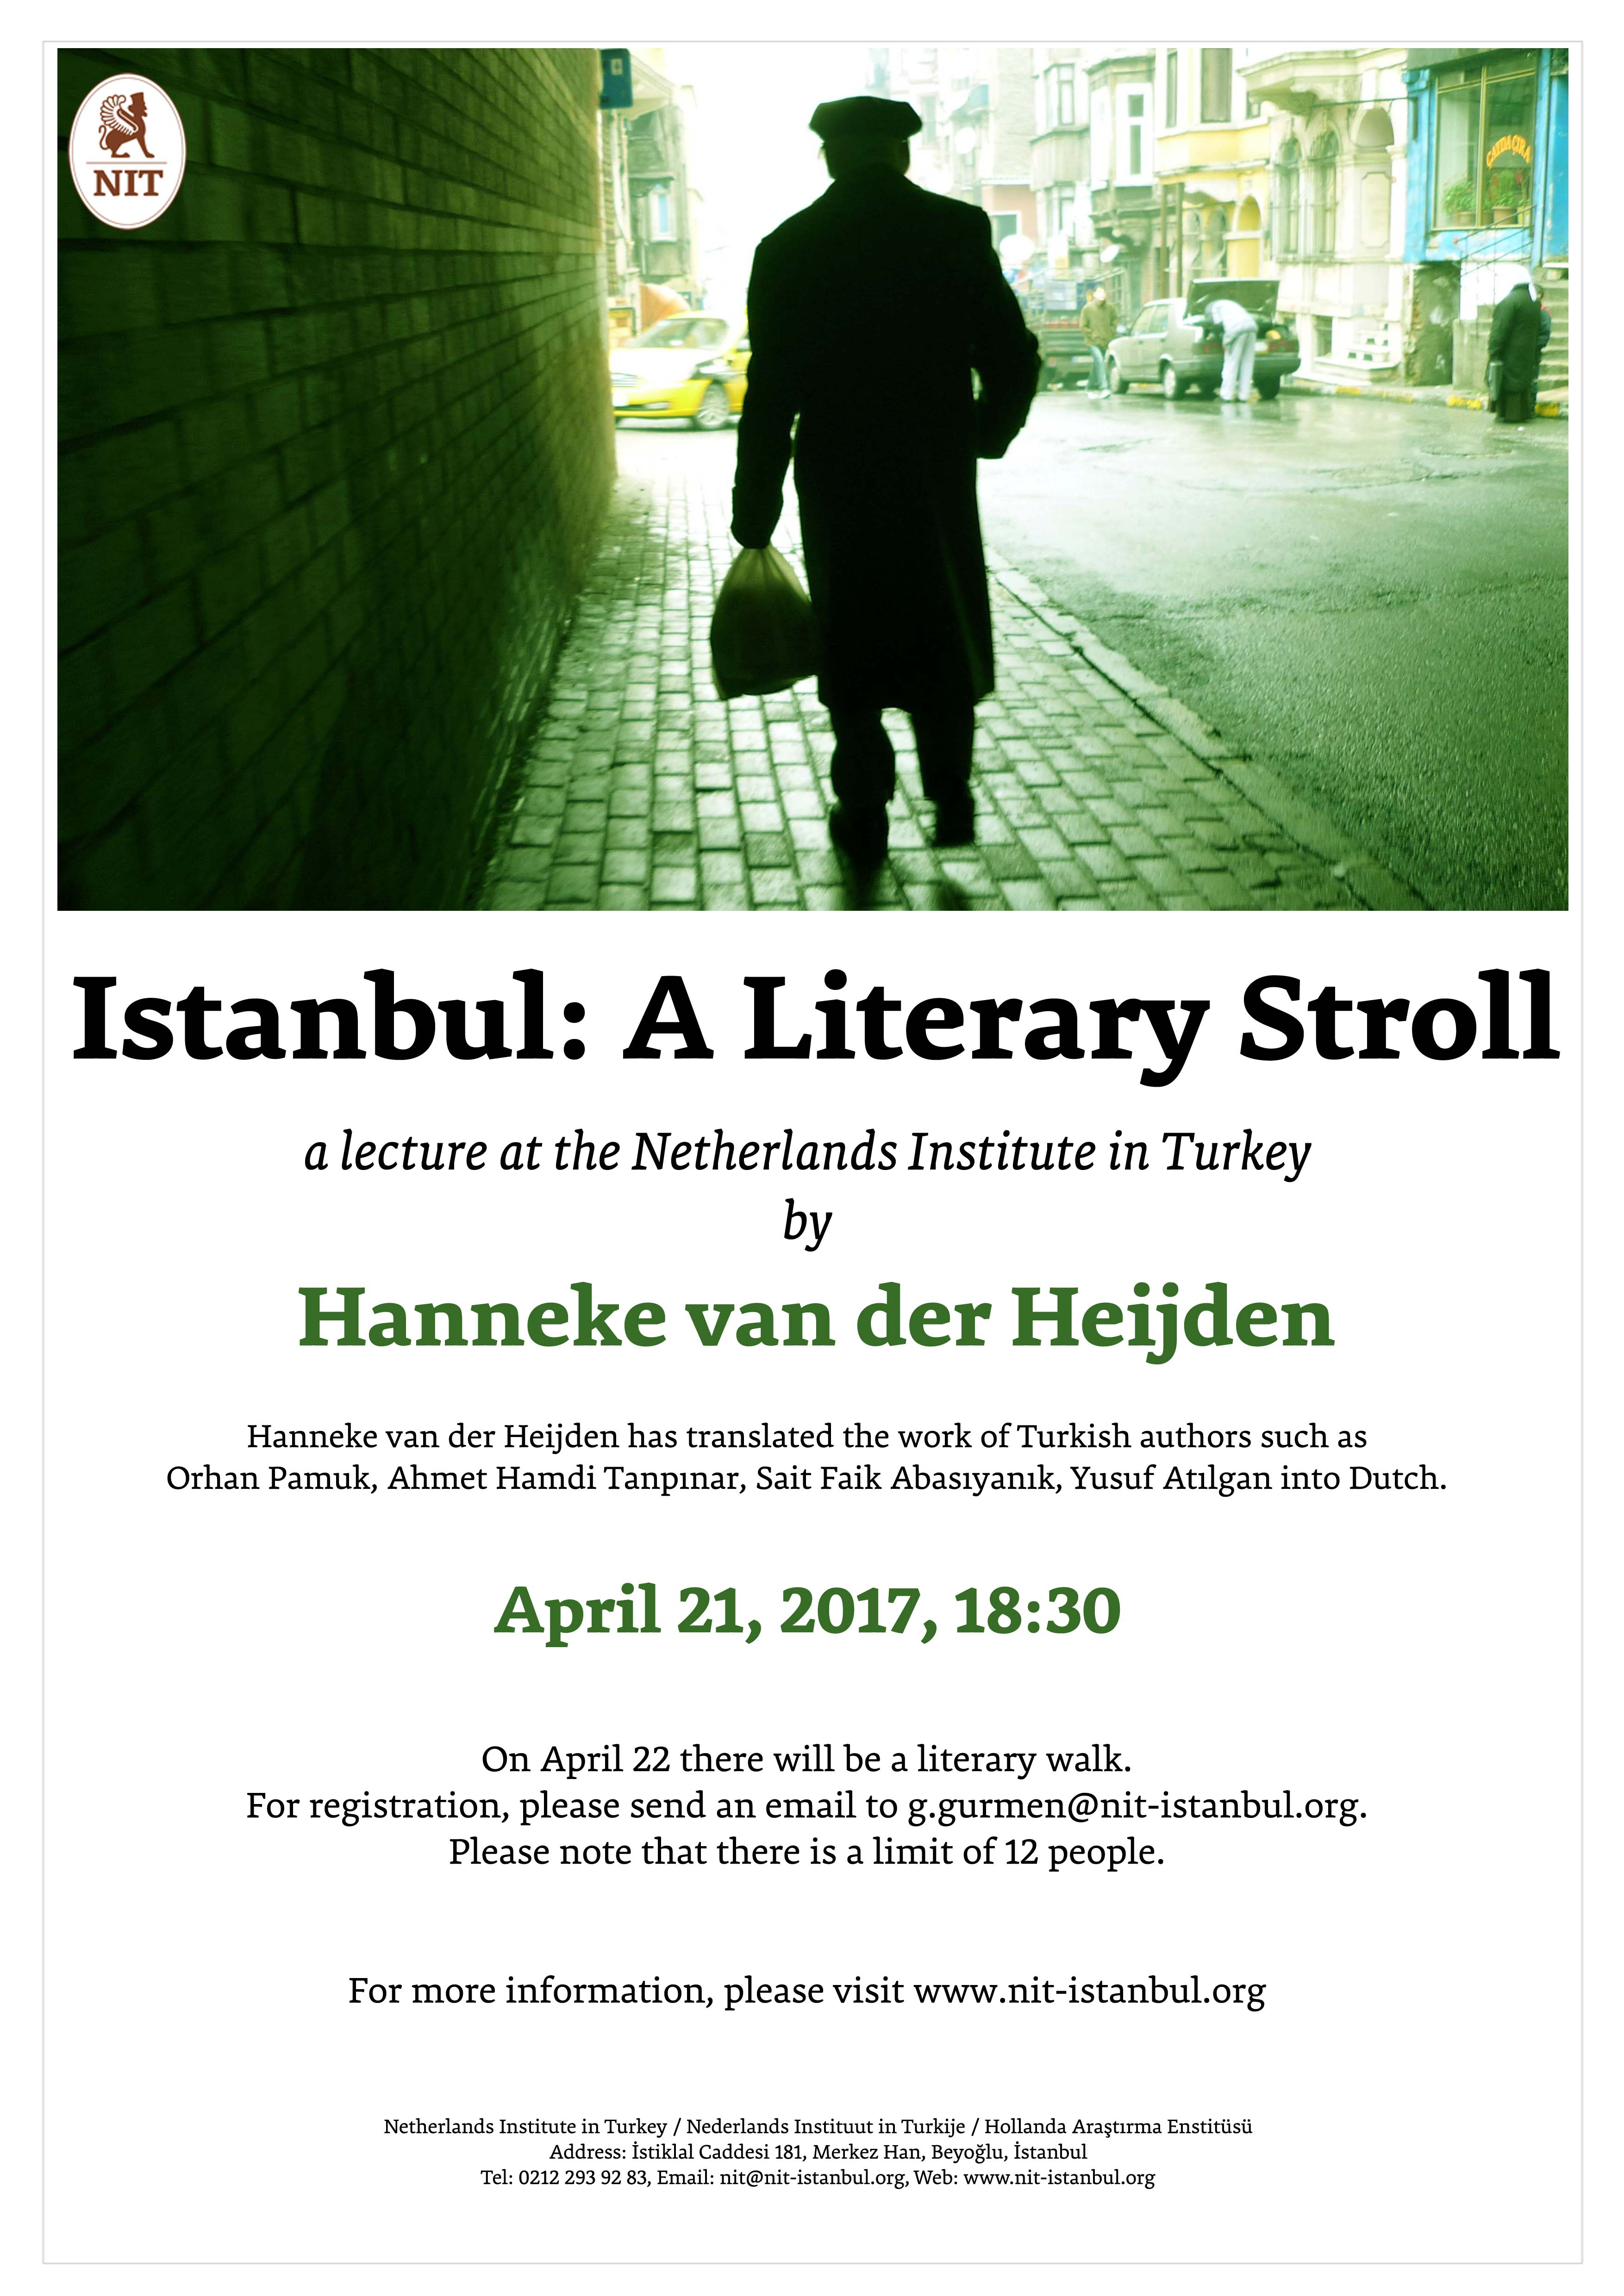 turkije april 2017